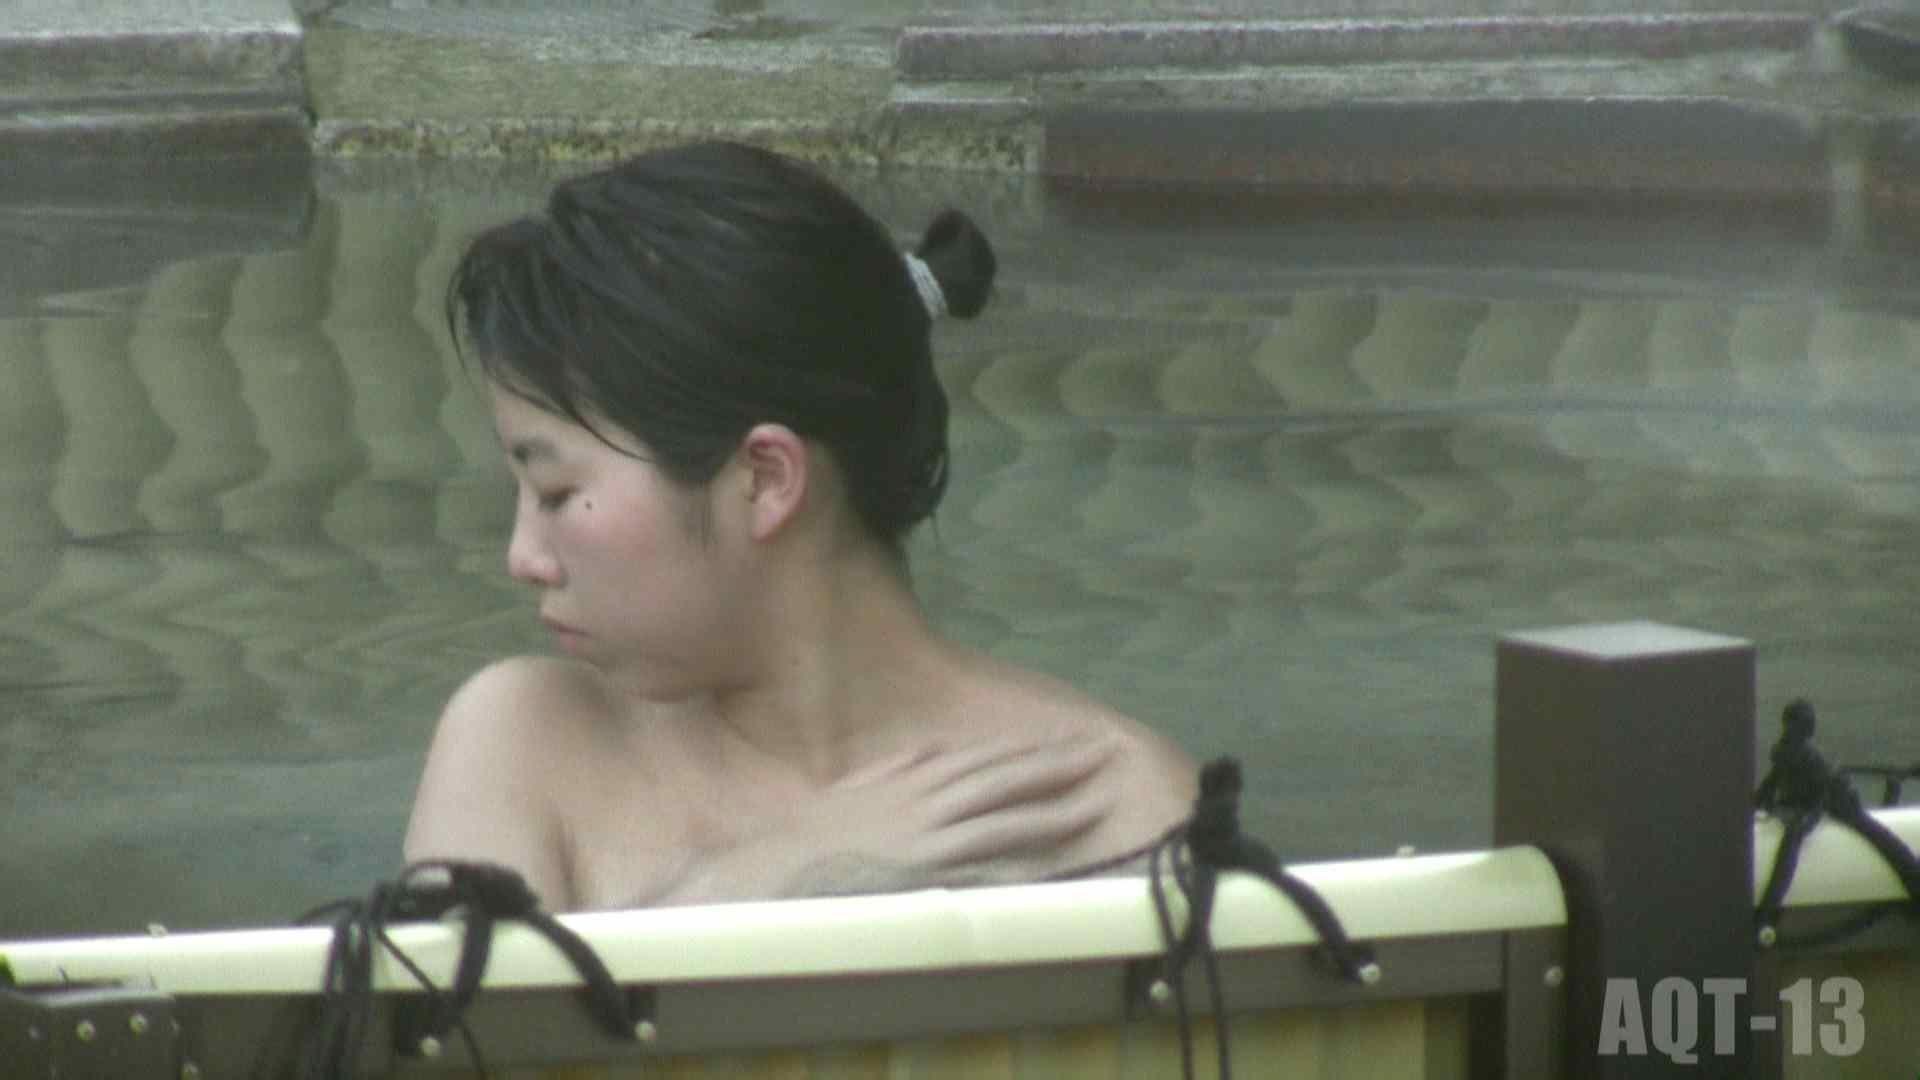 Aquaな露天風呂Vol.816 OLセックス | 露天  80画像 64